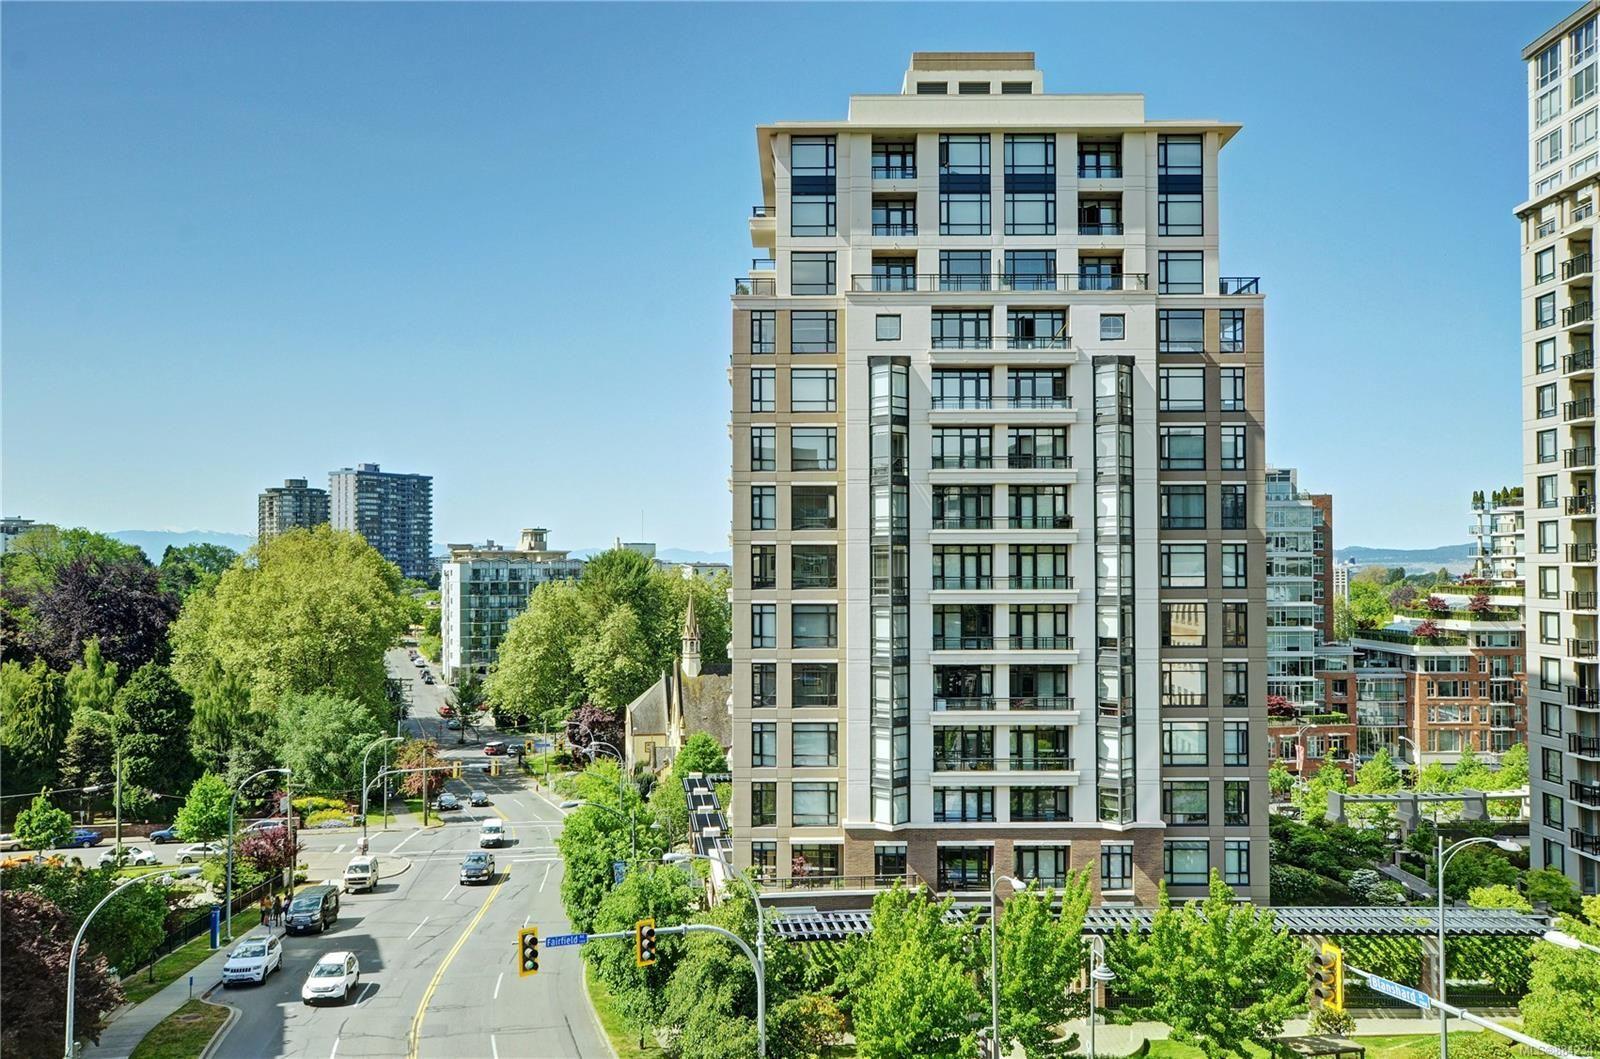 Main Photo: 1102 788 Humboldt St in : Vi Downtown Condo for sale (Victoria)  : MLS®# 884234